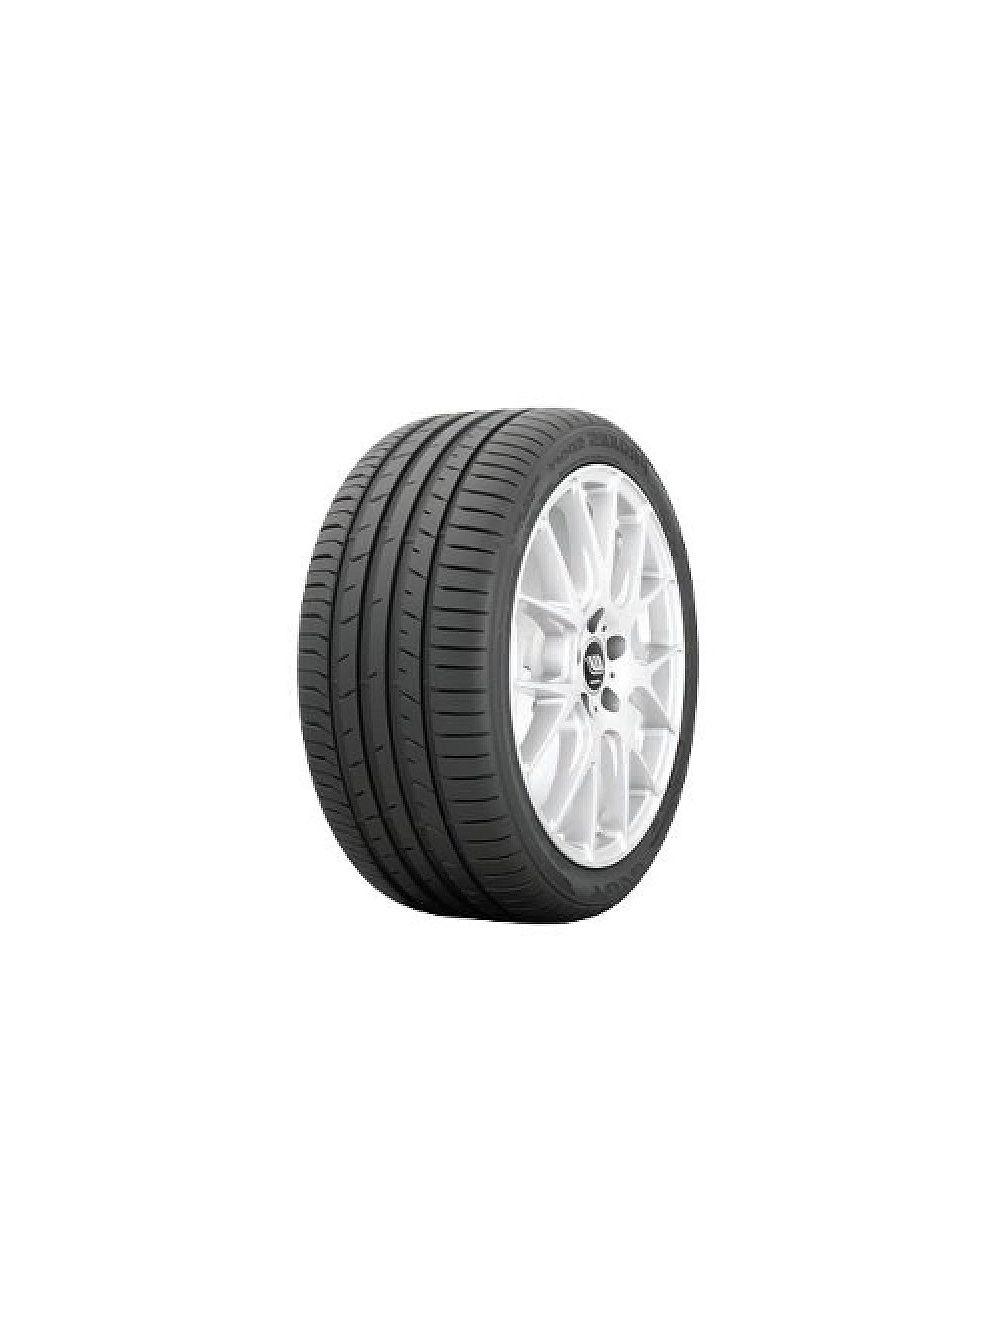 Toyo 275/35R20 Y Proxes Sport XL Nyári gumi